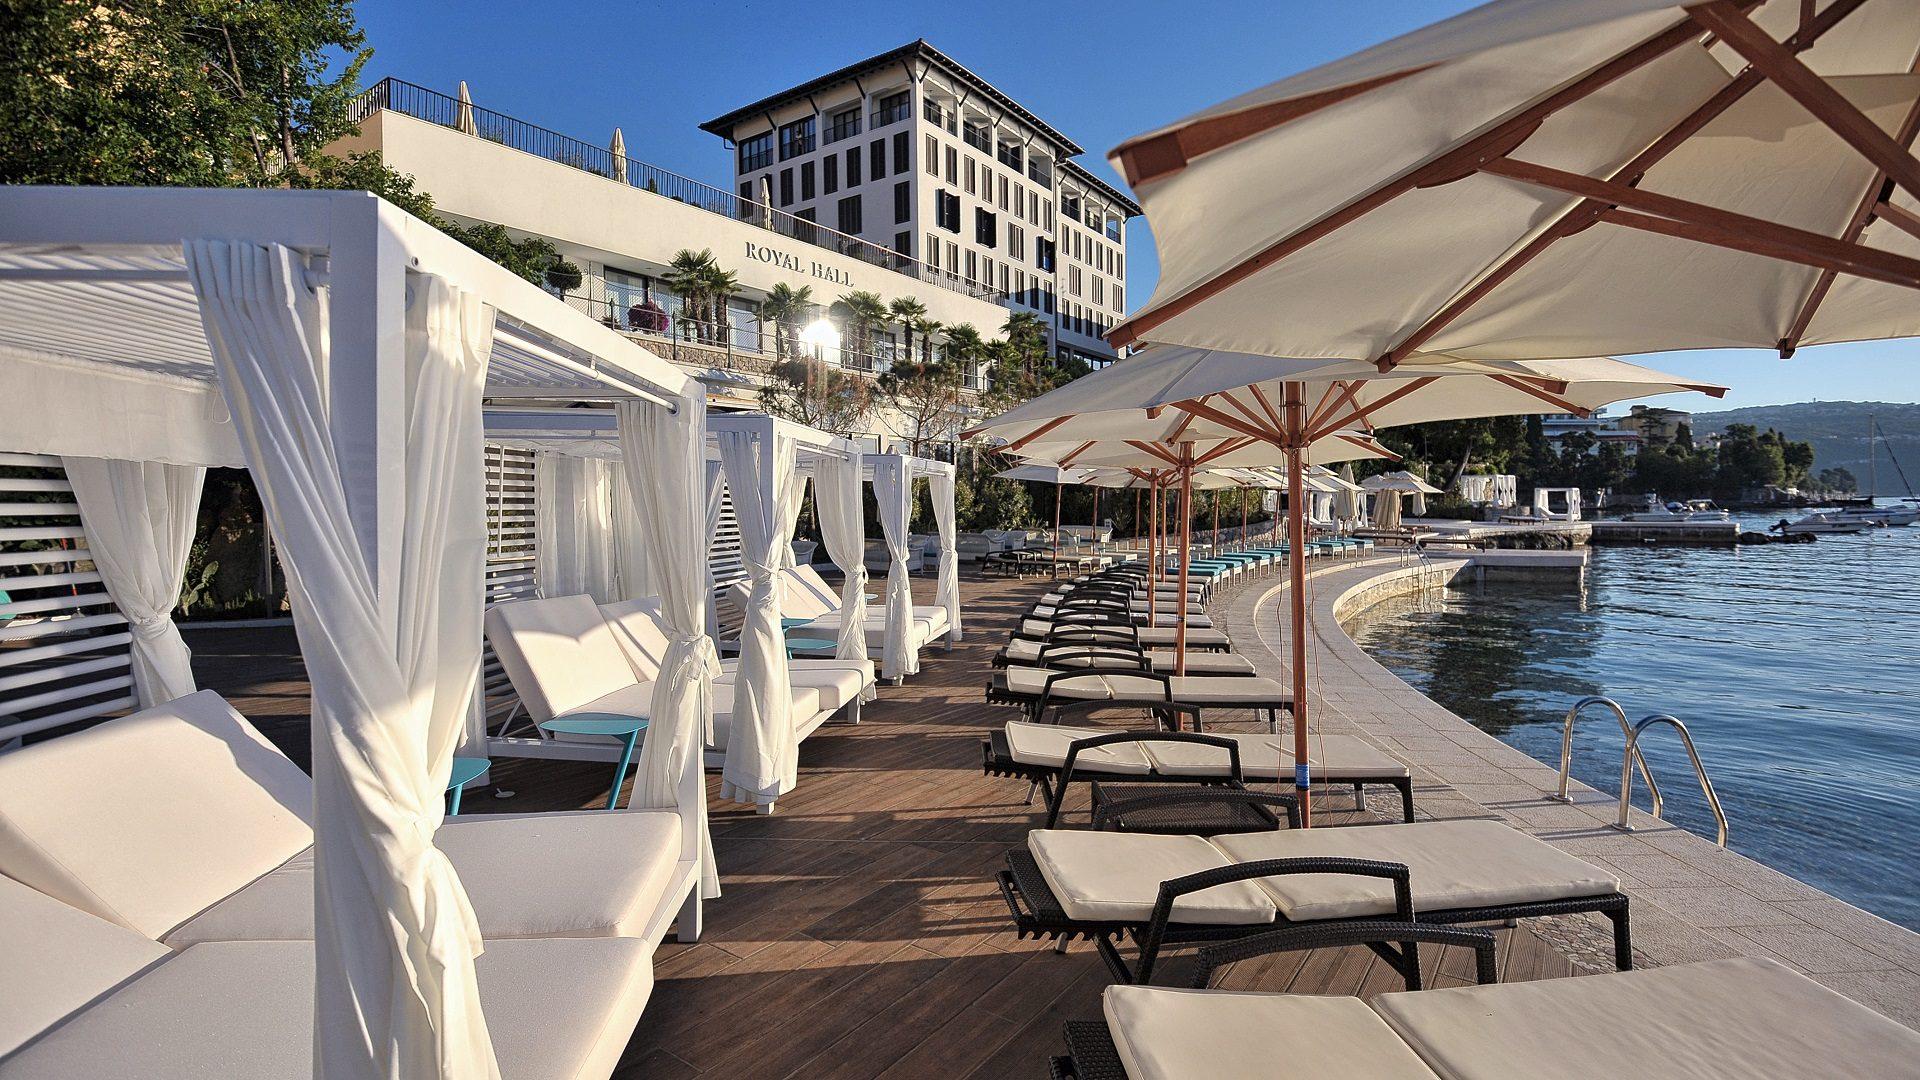 amadria park royal hotel in opatija croatia official web